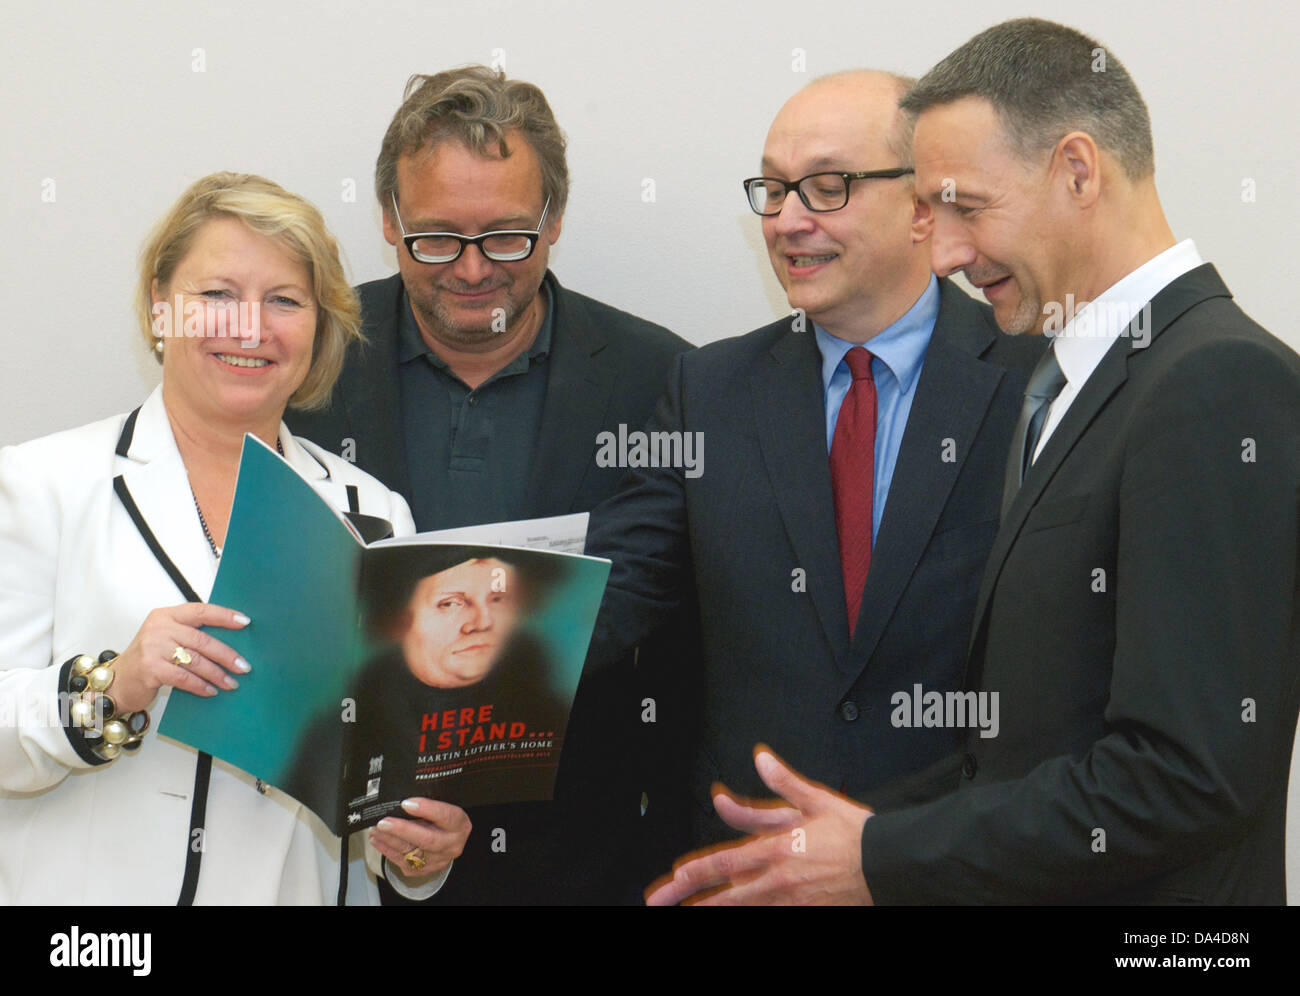 Cornelia Pieper L Stockfotos & Cornelia Pieper L Bilder - Alamy